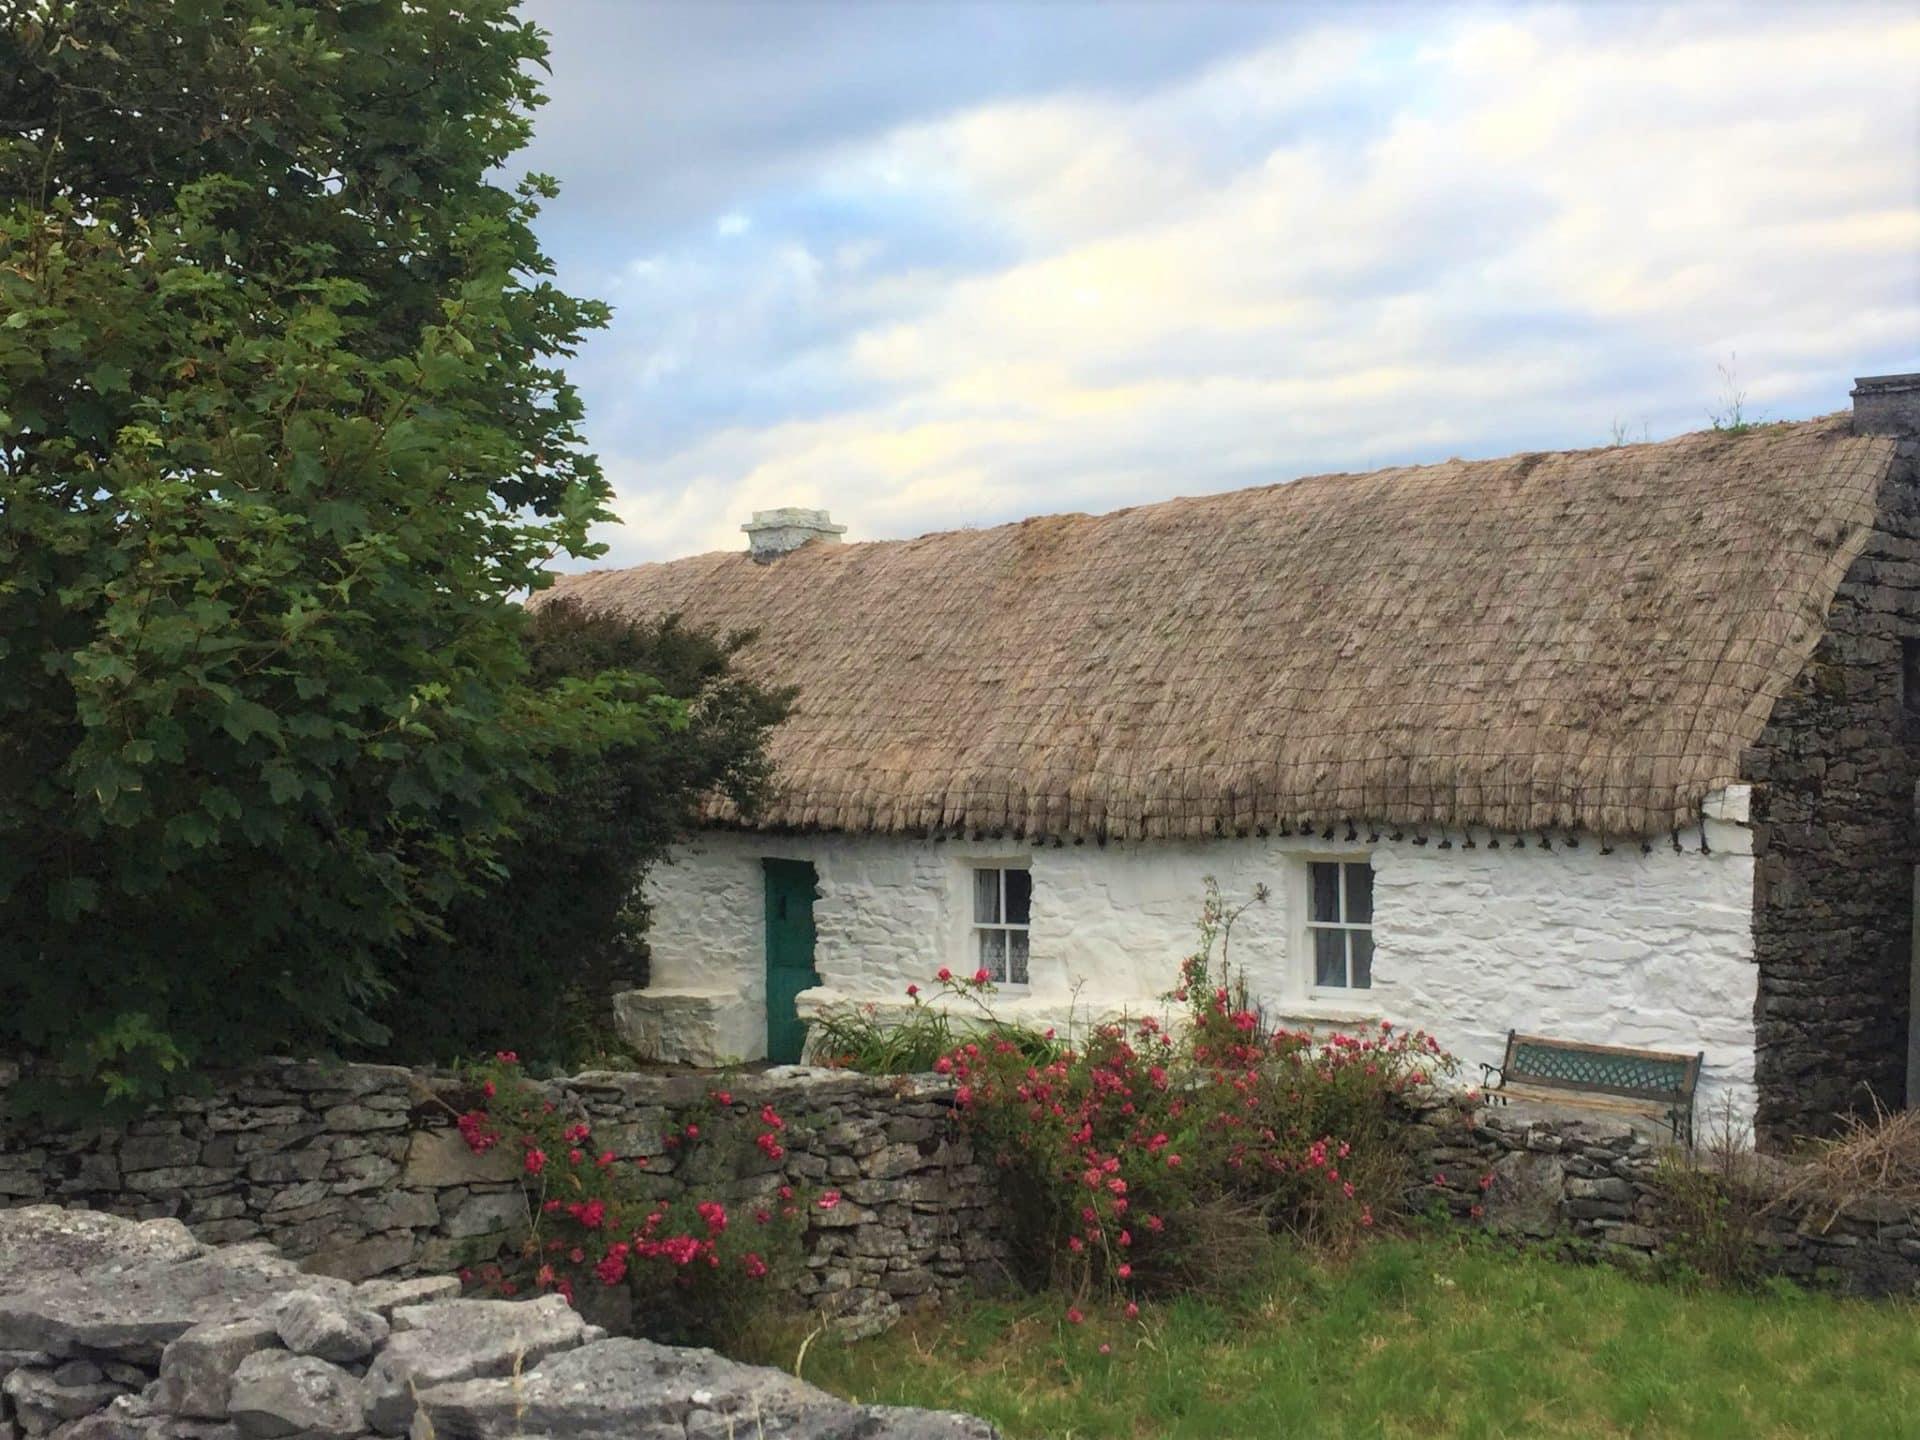 Teach Synge Home of John Millington Synge - Visit Galway